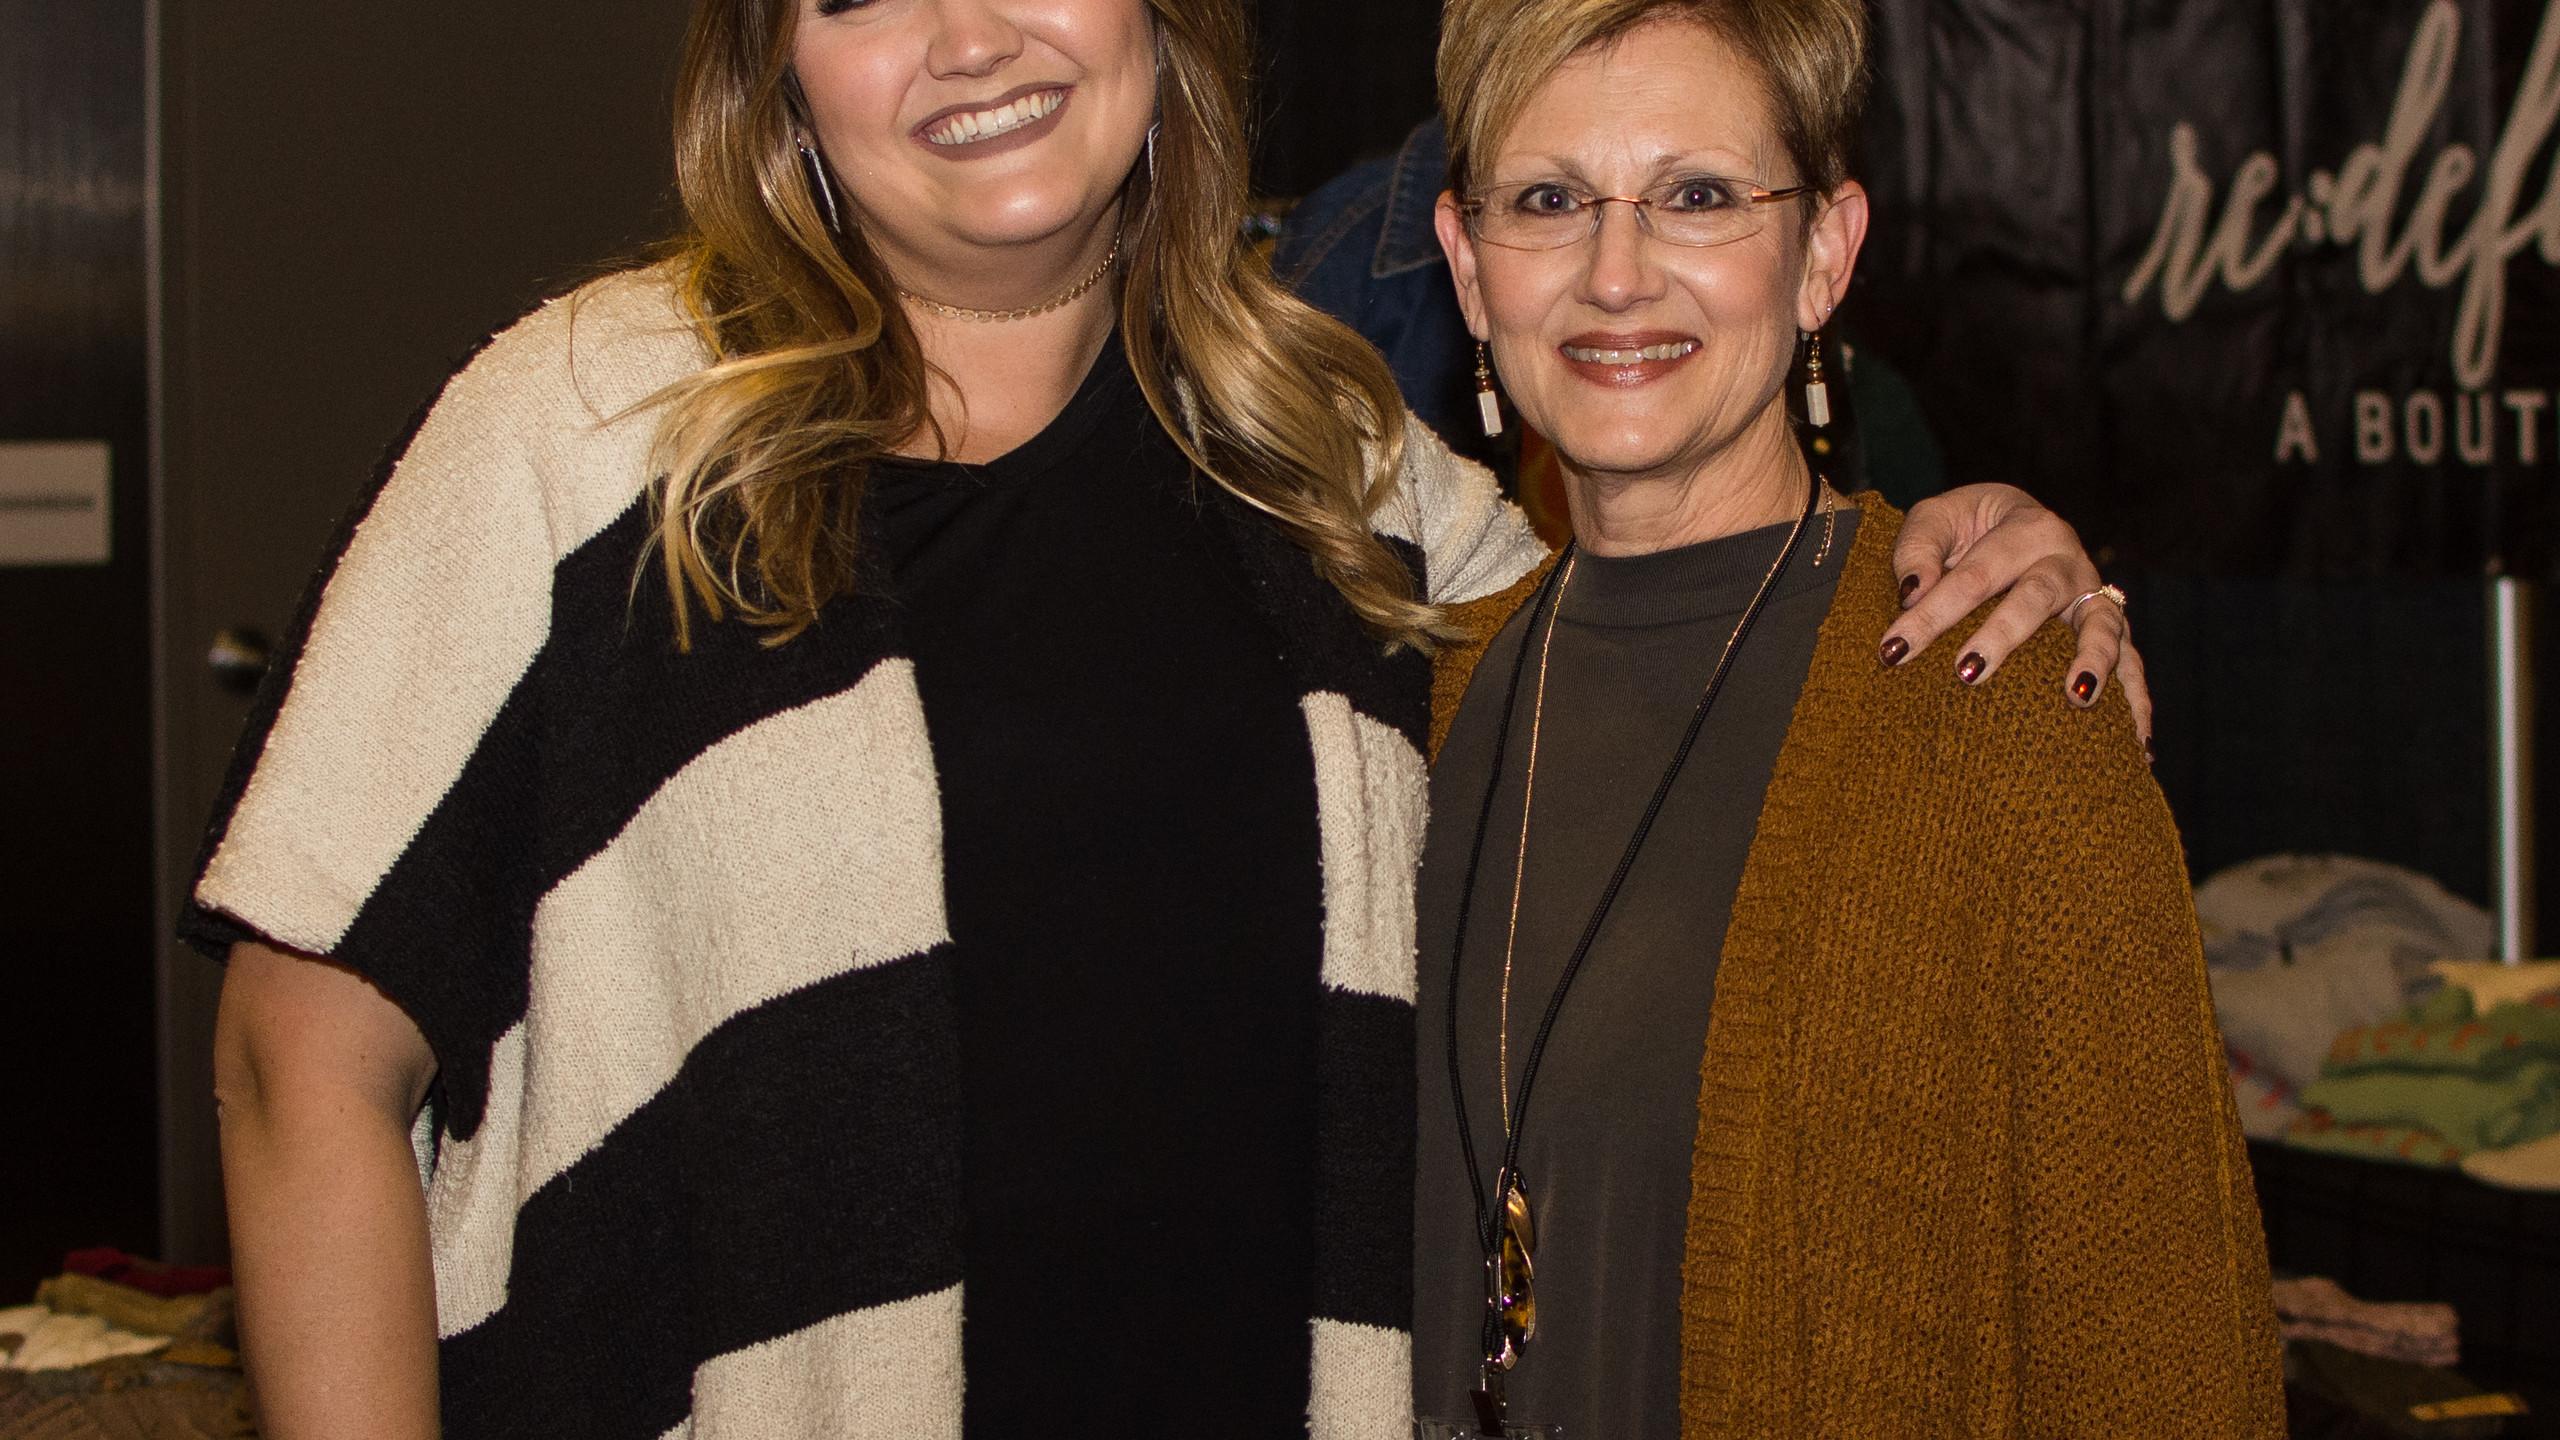 Jenna Boykin and Theresa Loxley